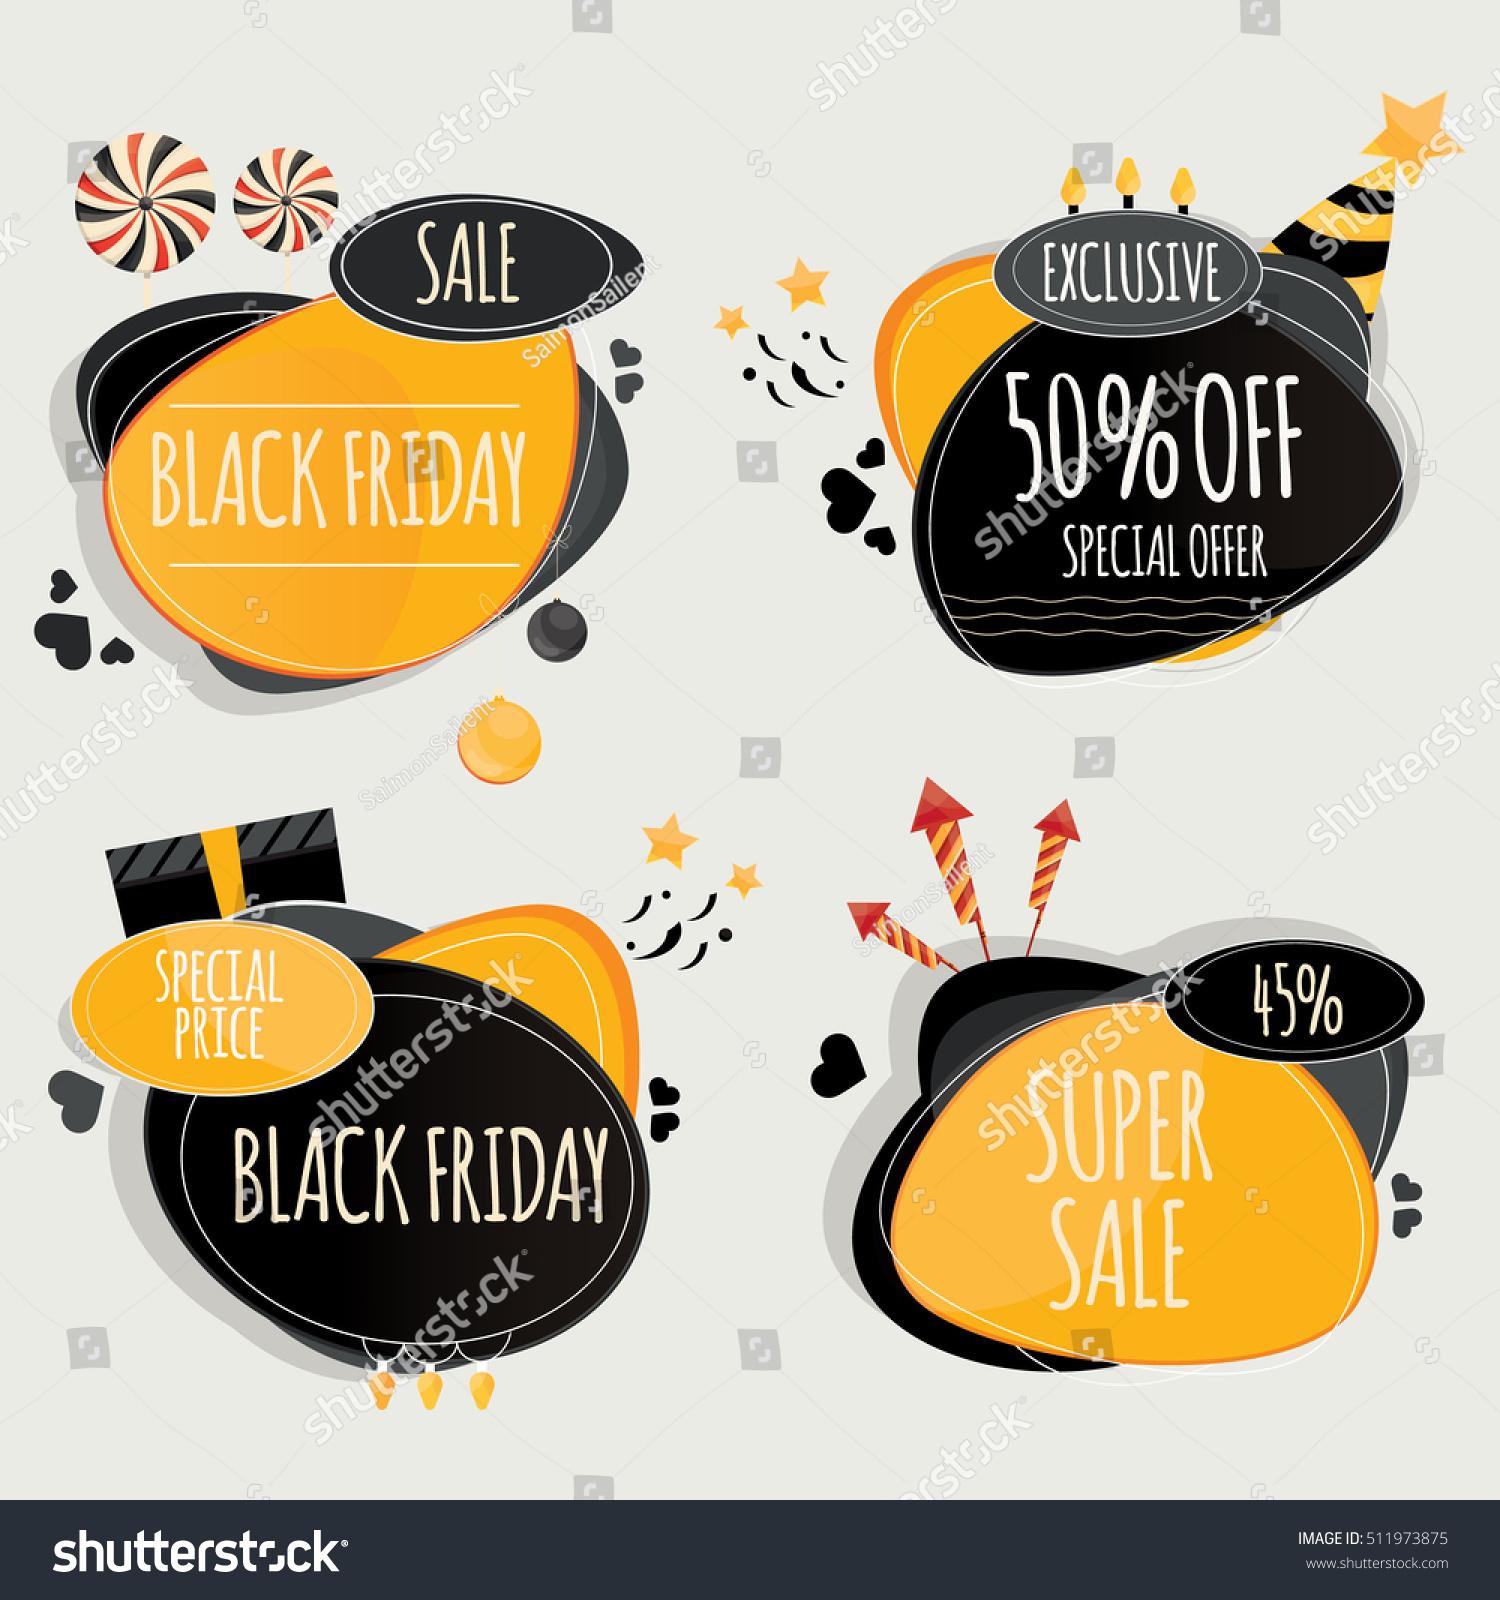 Alien Bees Black Friday Sale: Set Black Friday Design Elements Colorful Stock Vector